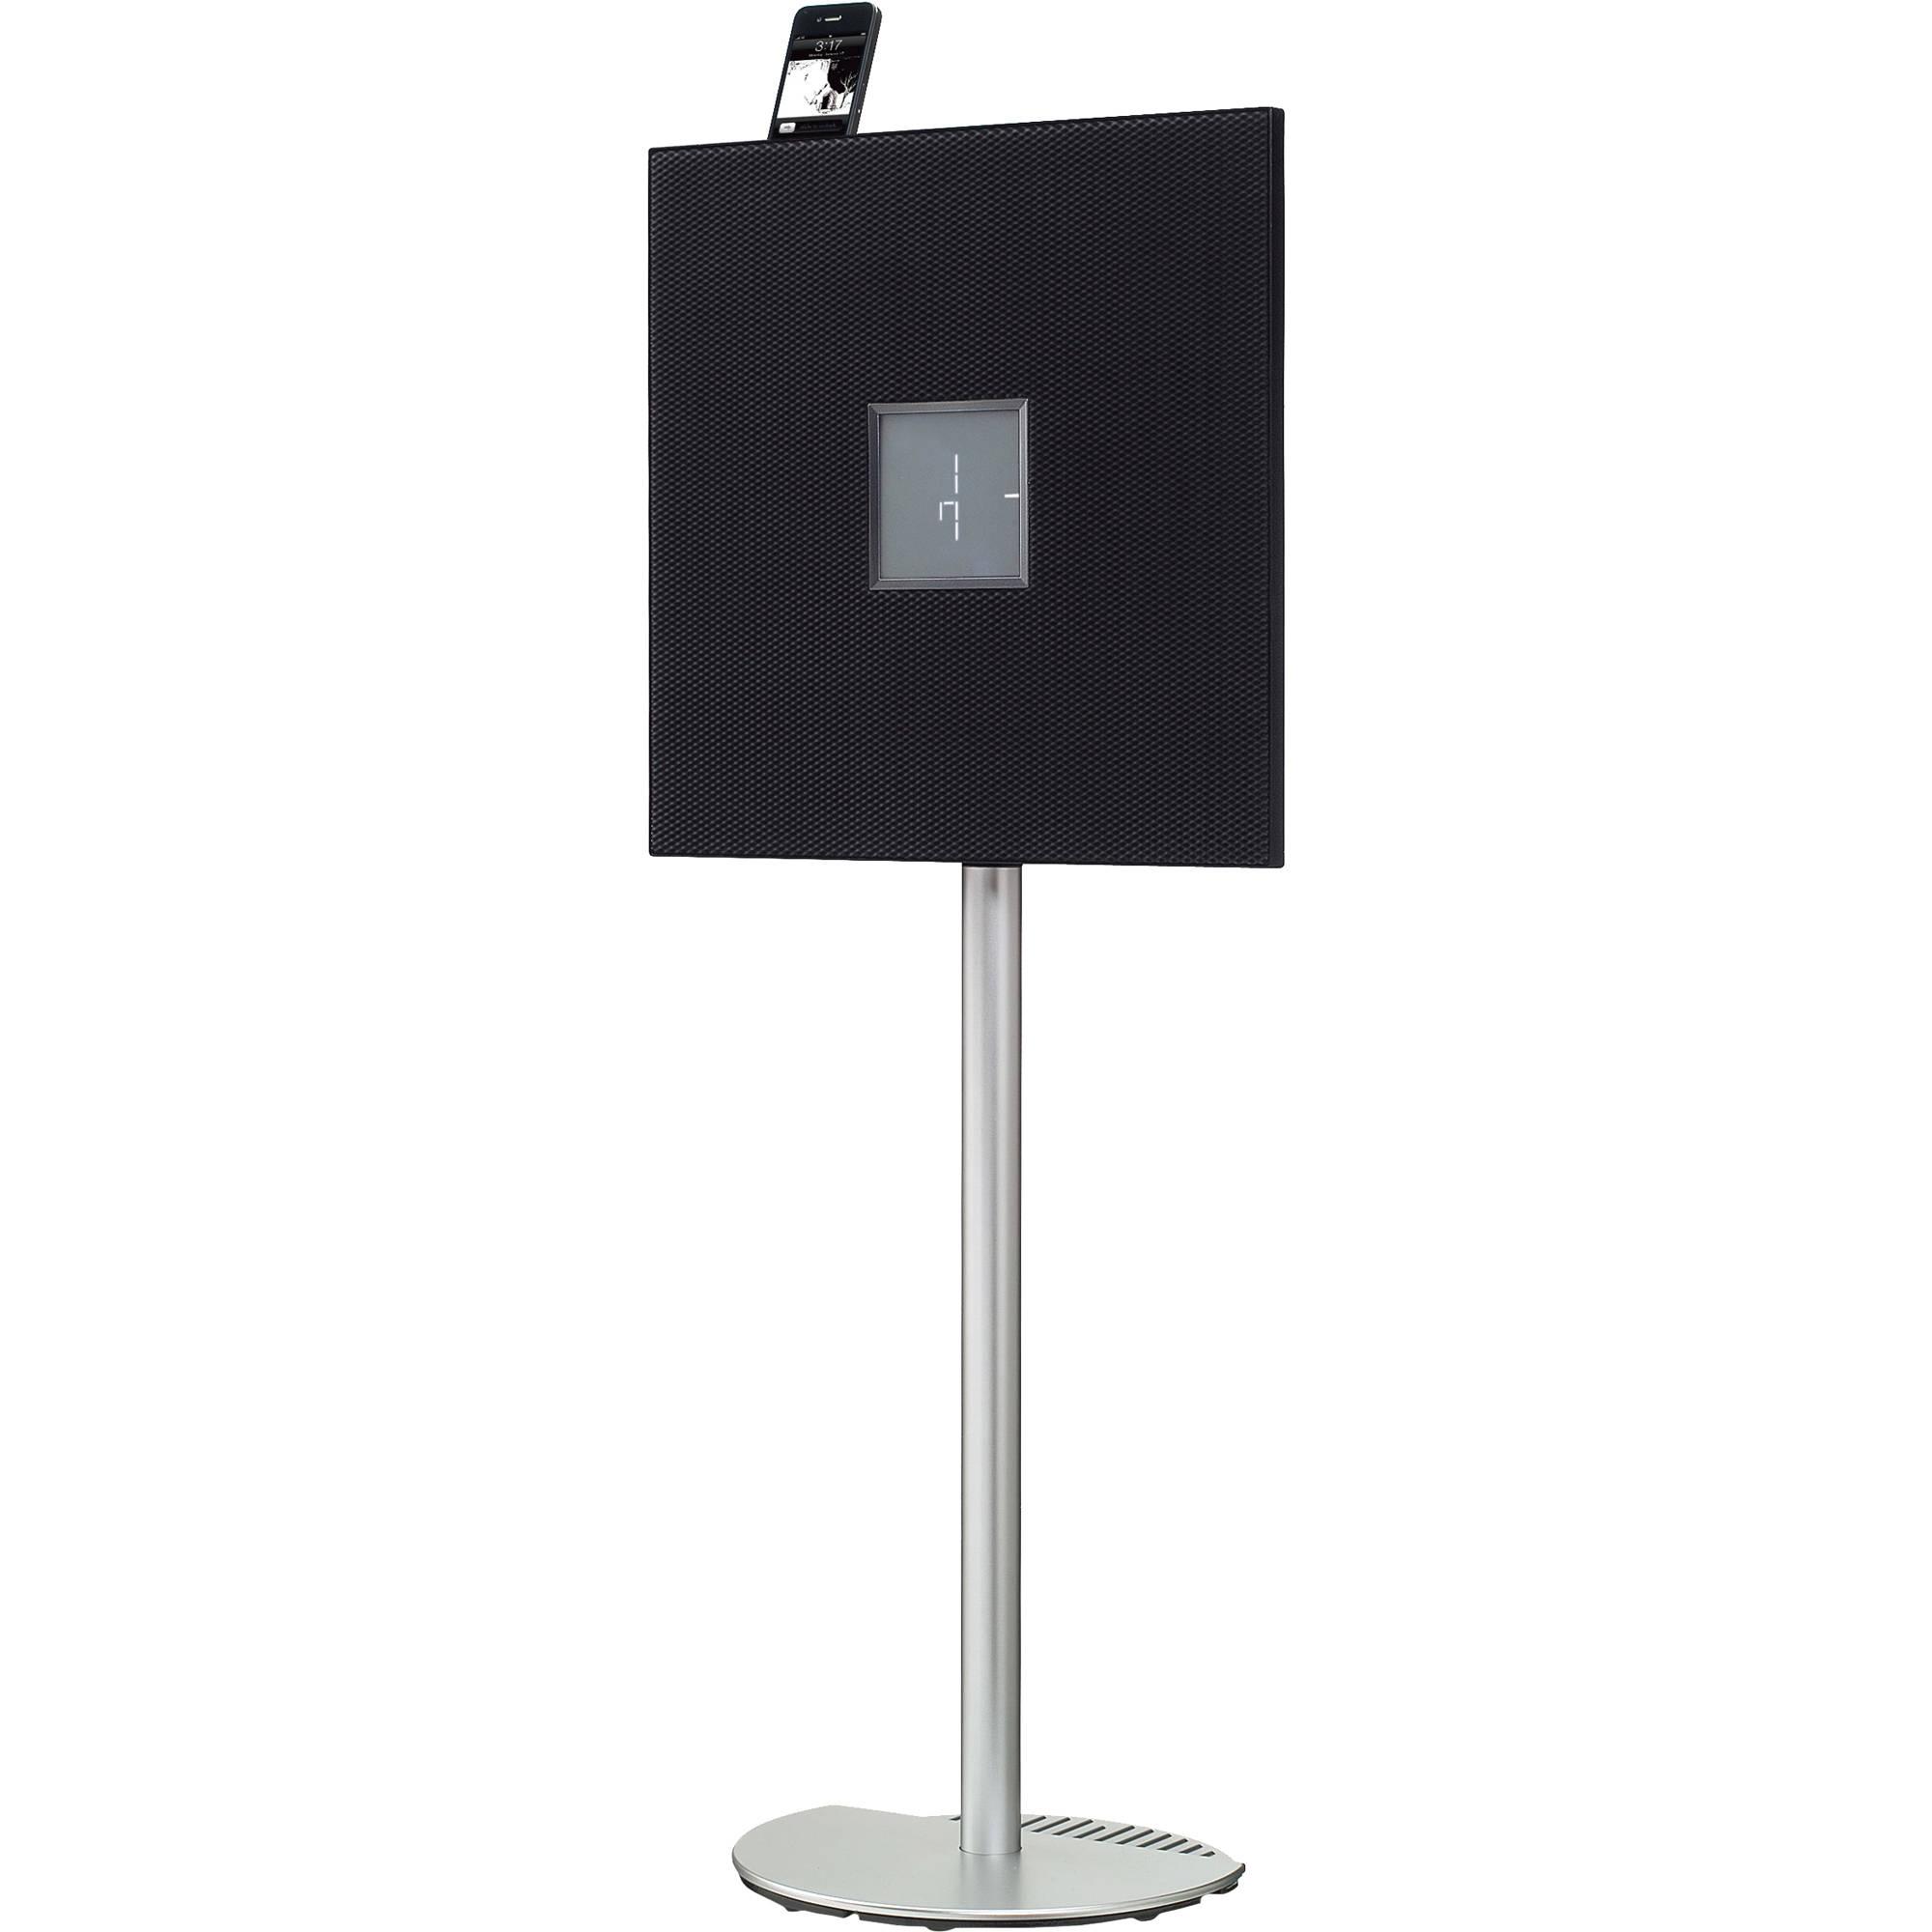 yamaha restio isx 800 floor standing style desktop isx. Black Bedroom Furniture Sets. Home Design Ideas